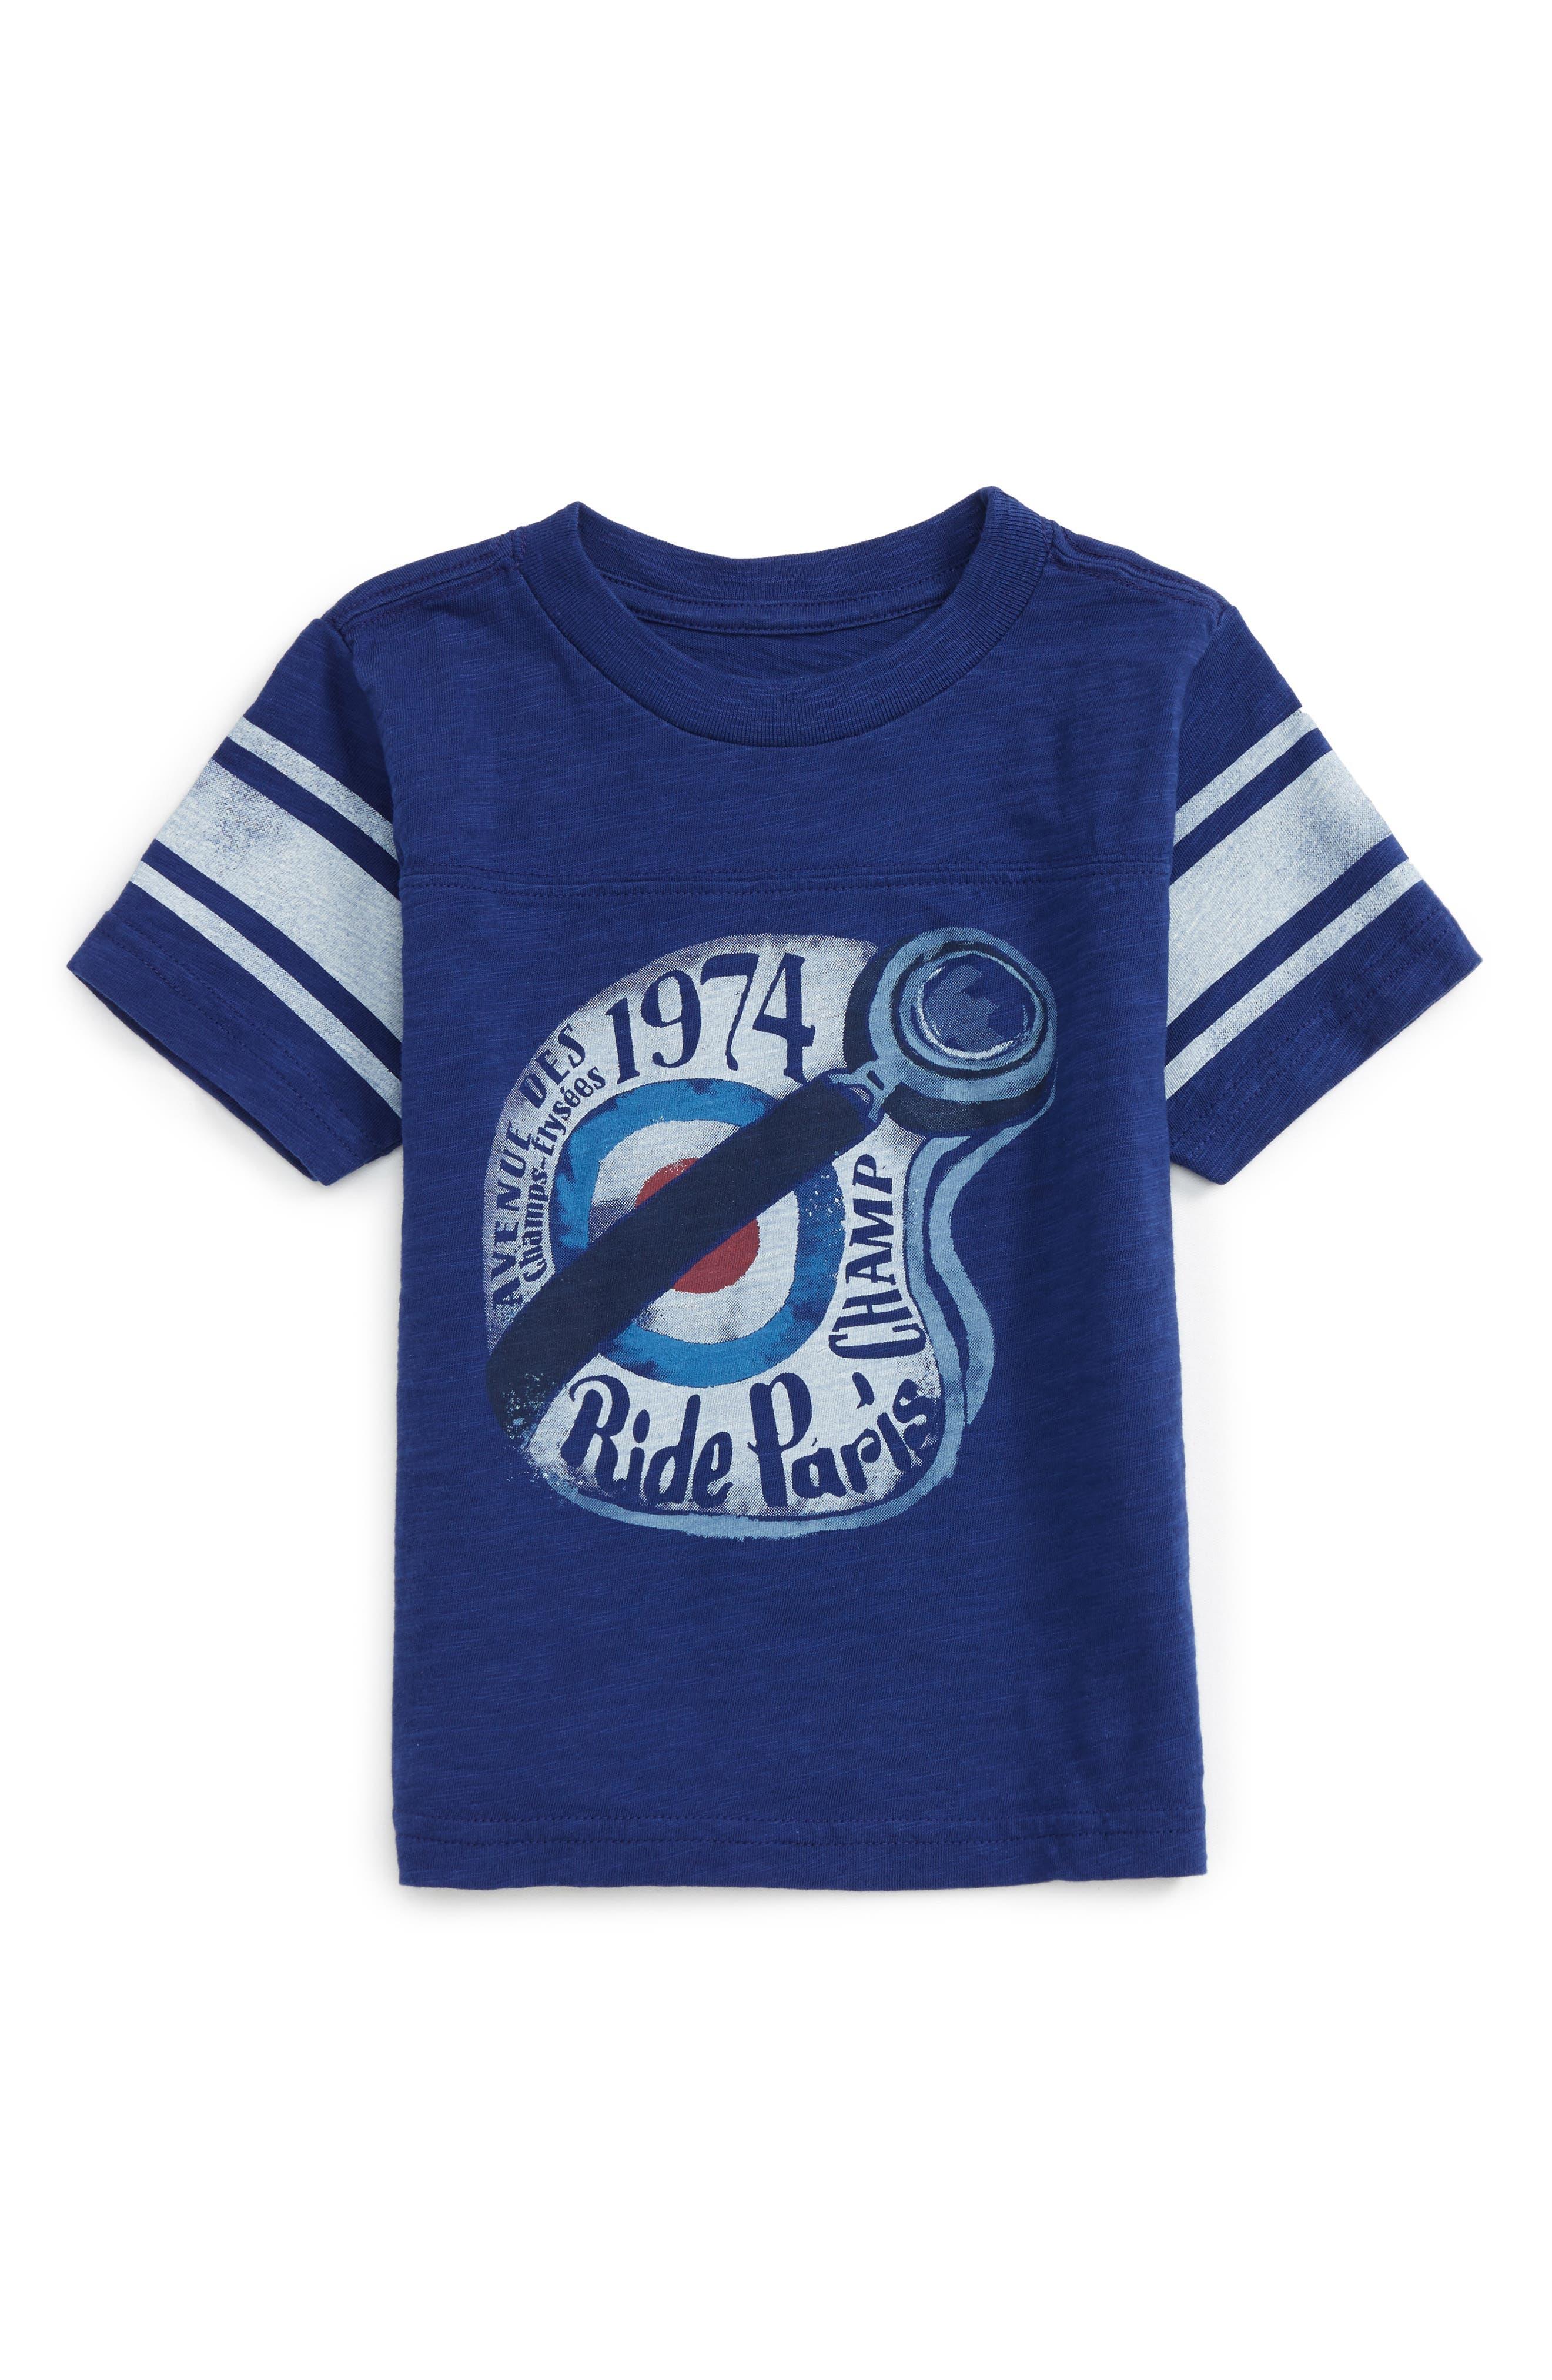 Alternate Image 1 Selected - Peek Helmet Graphic T-Shirt (Toddler Boys, Little Boys & Big Boys)